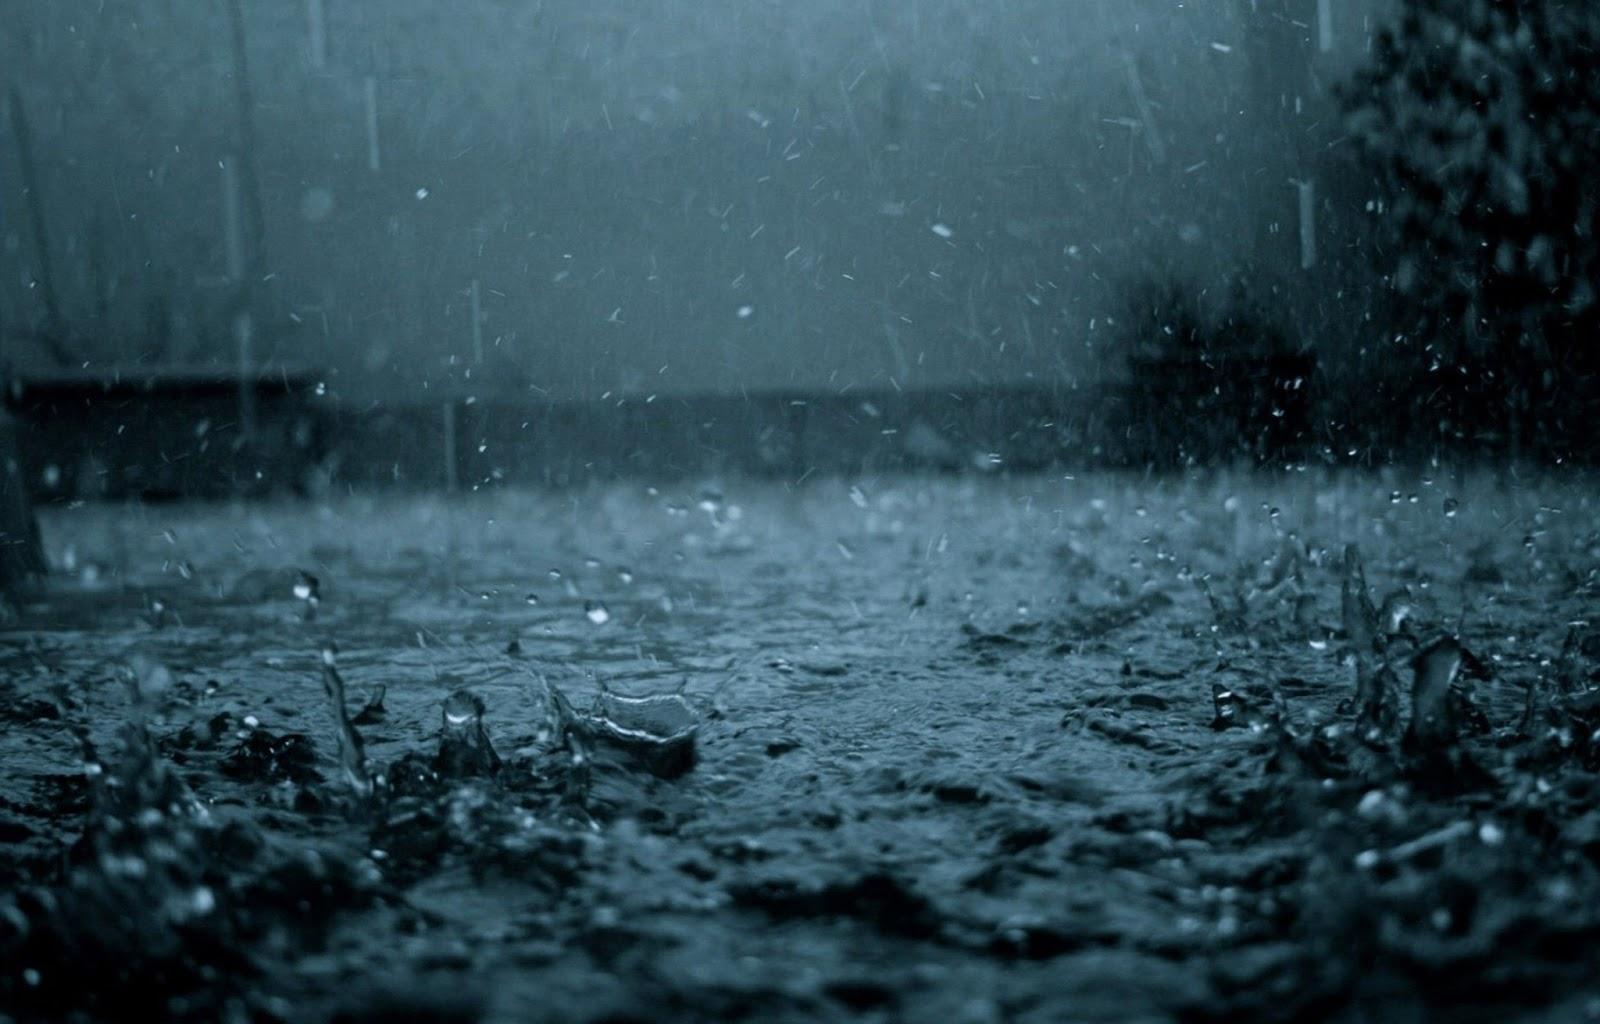 Hd wallpaper rain - Rain Photography Hd Wallpapers